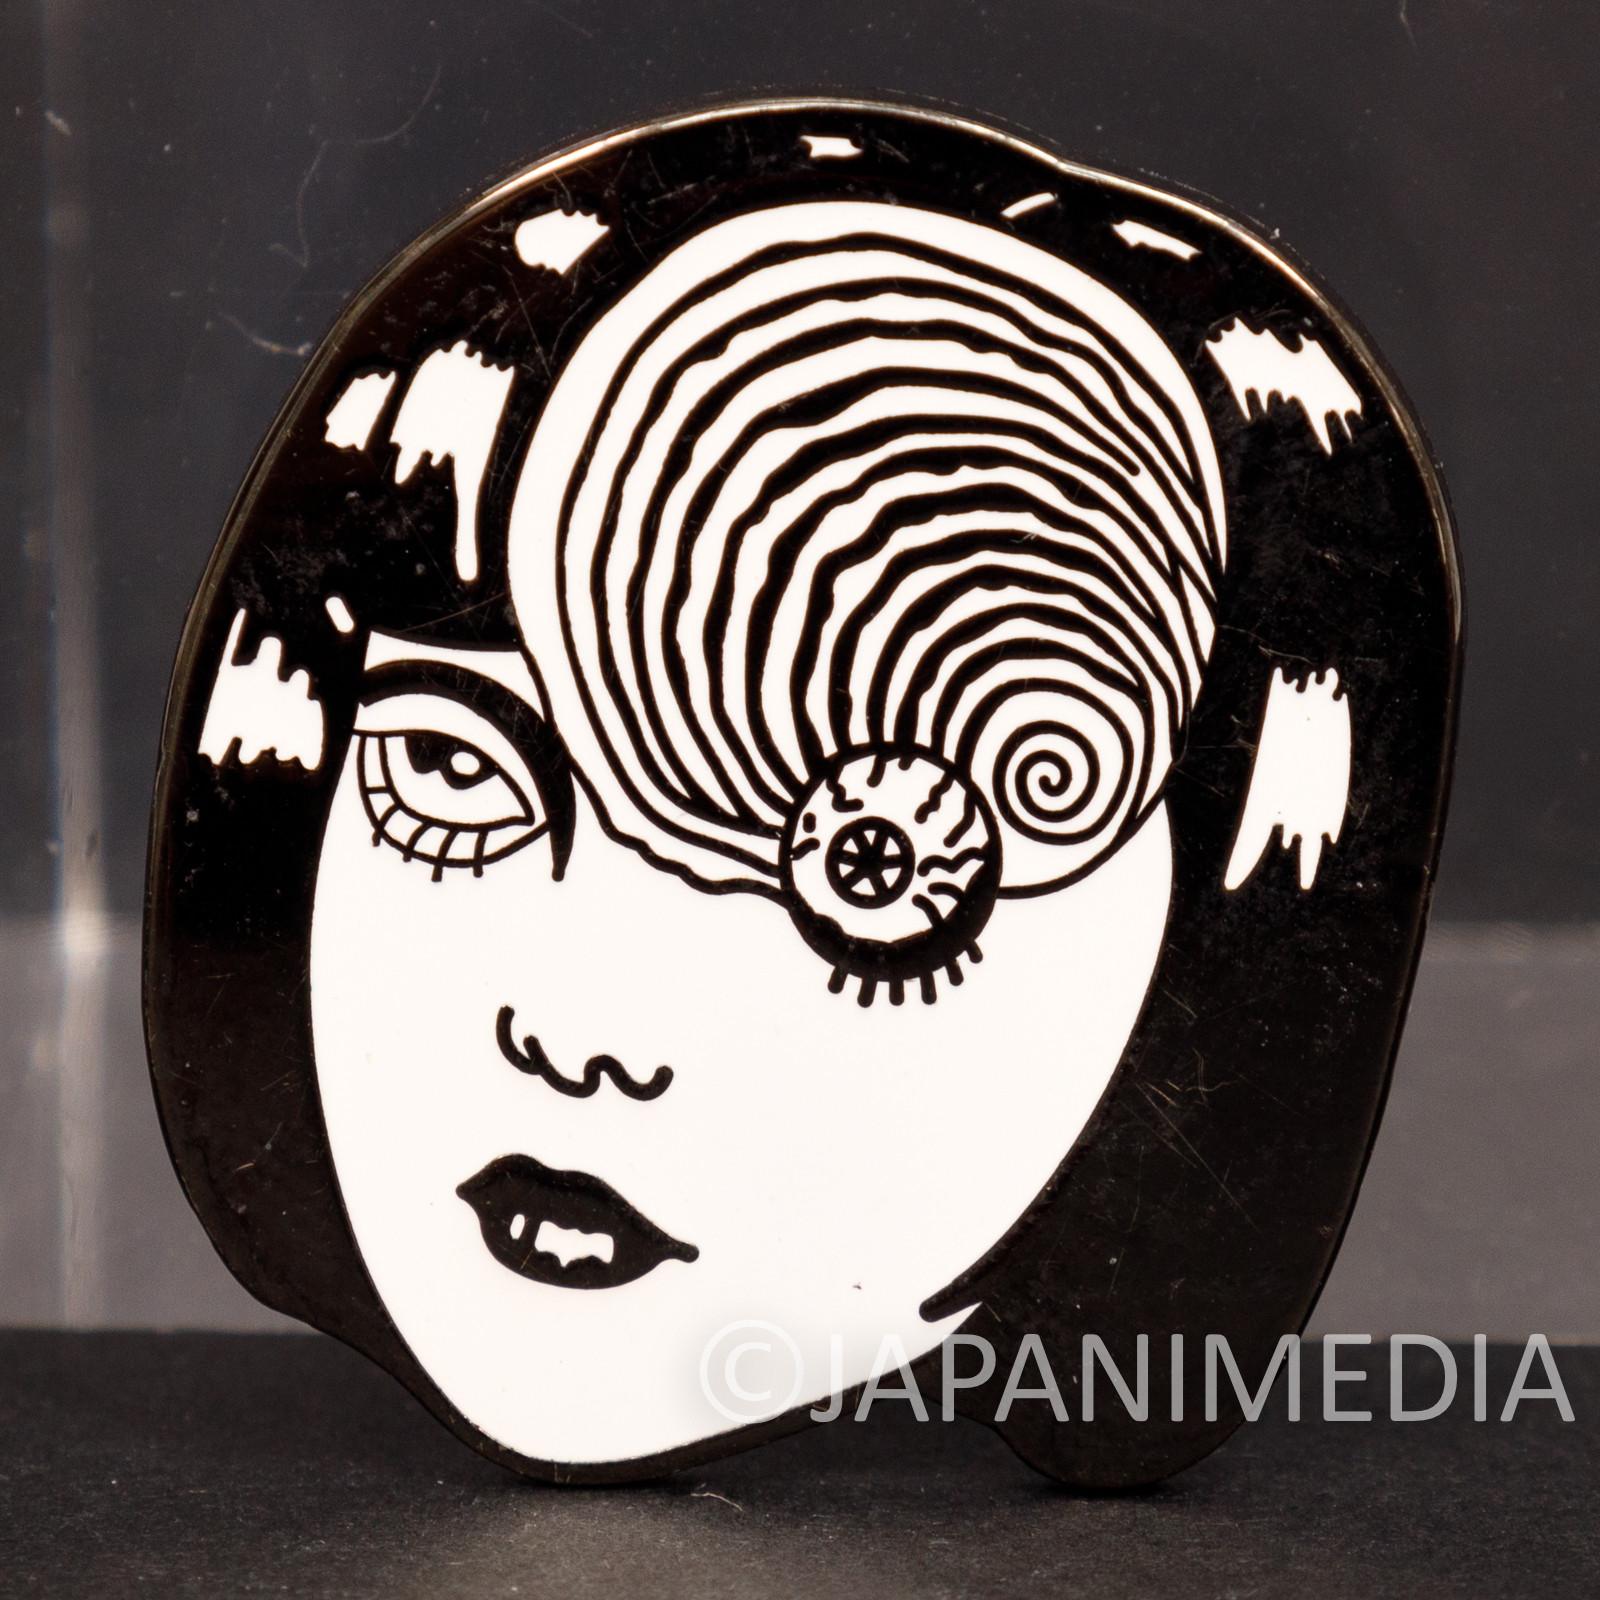 Uzumaki Junji Ito Metal Pins Horror MANGA JAPAN ANIME